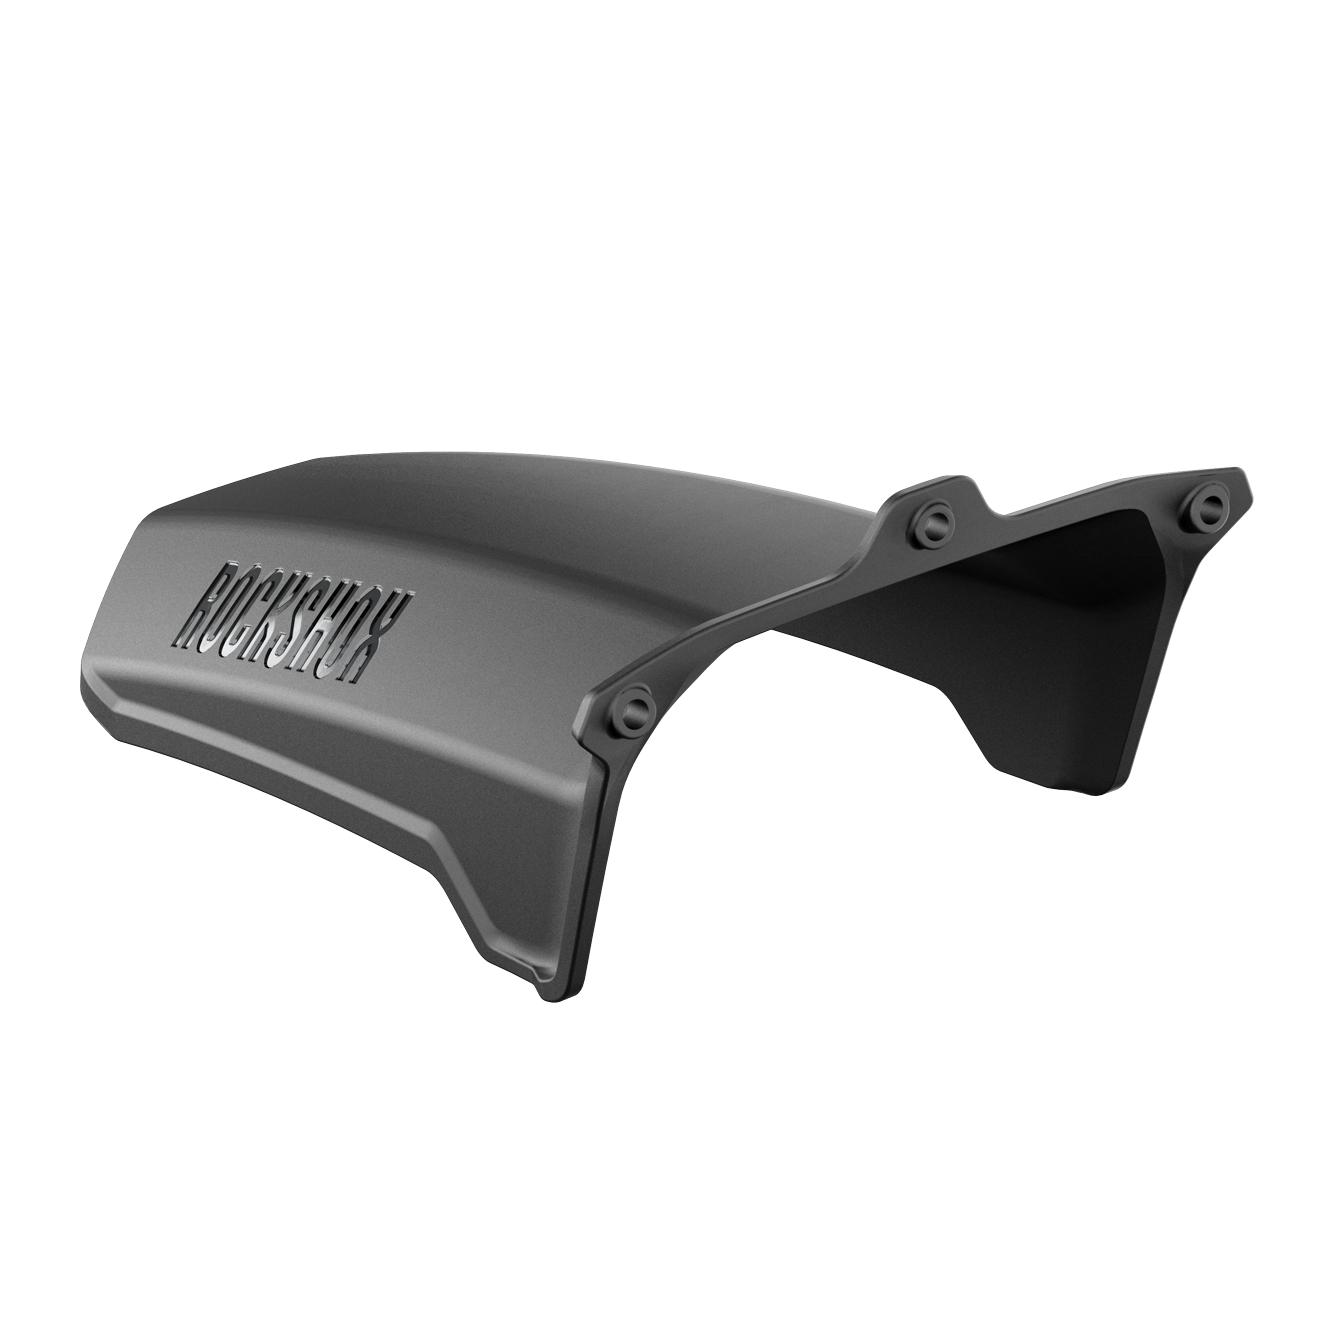 RockShox MTB Guardabarro corto - ZEB (A1+/2021+) - black